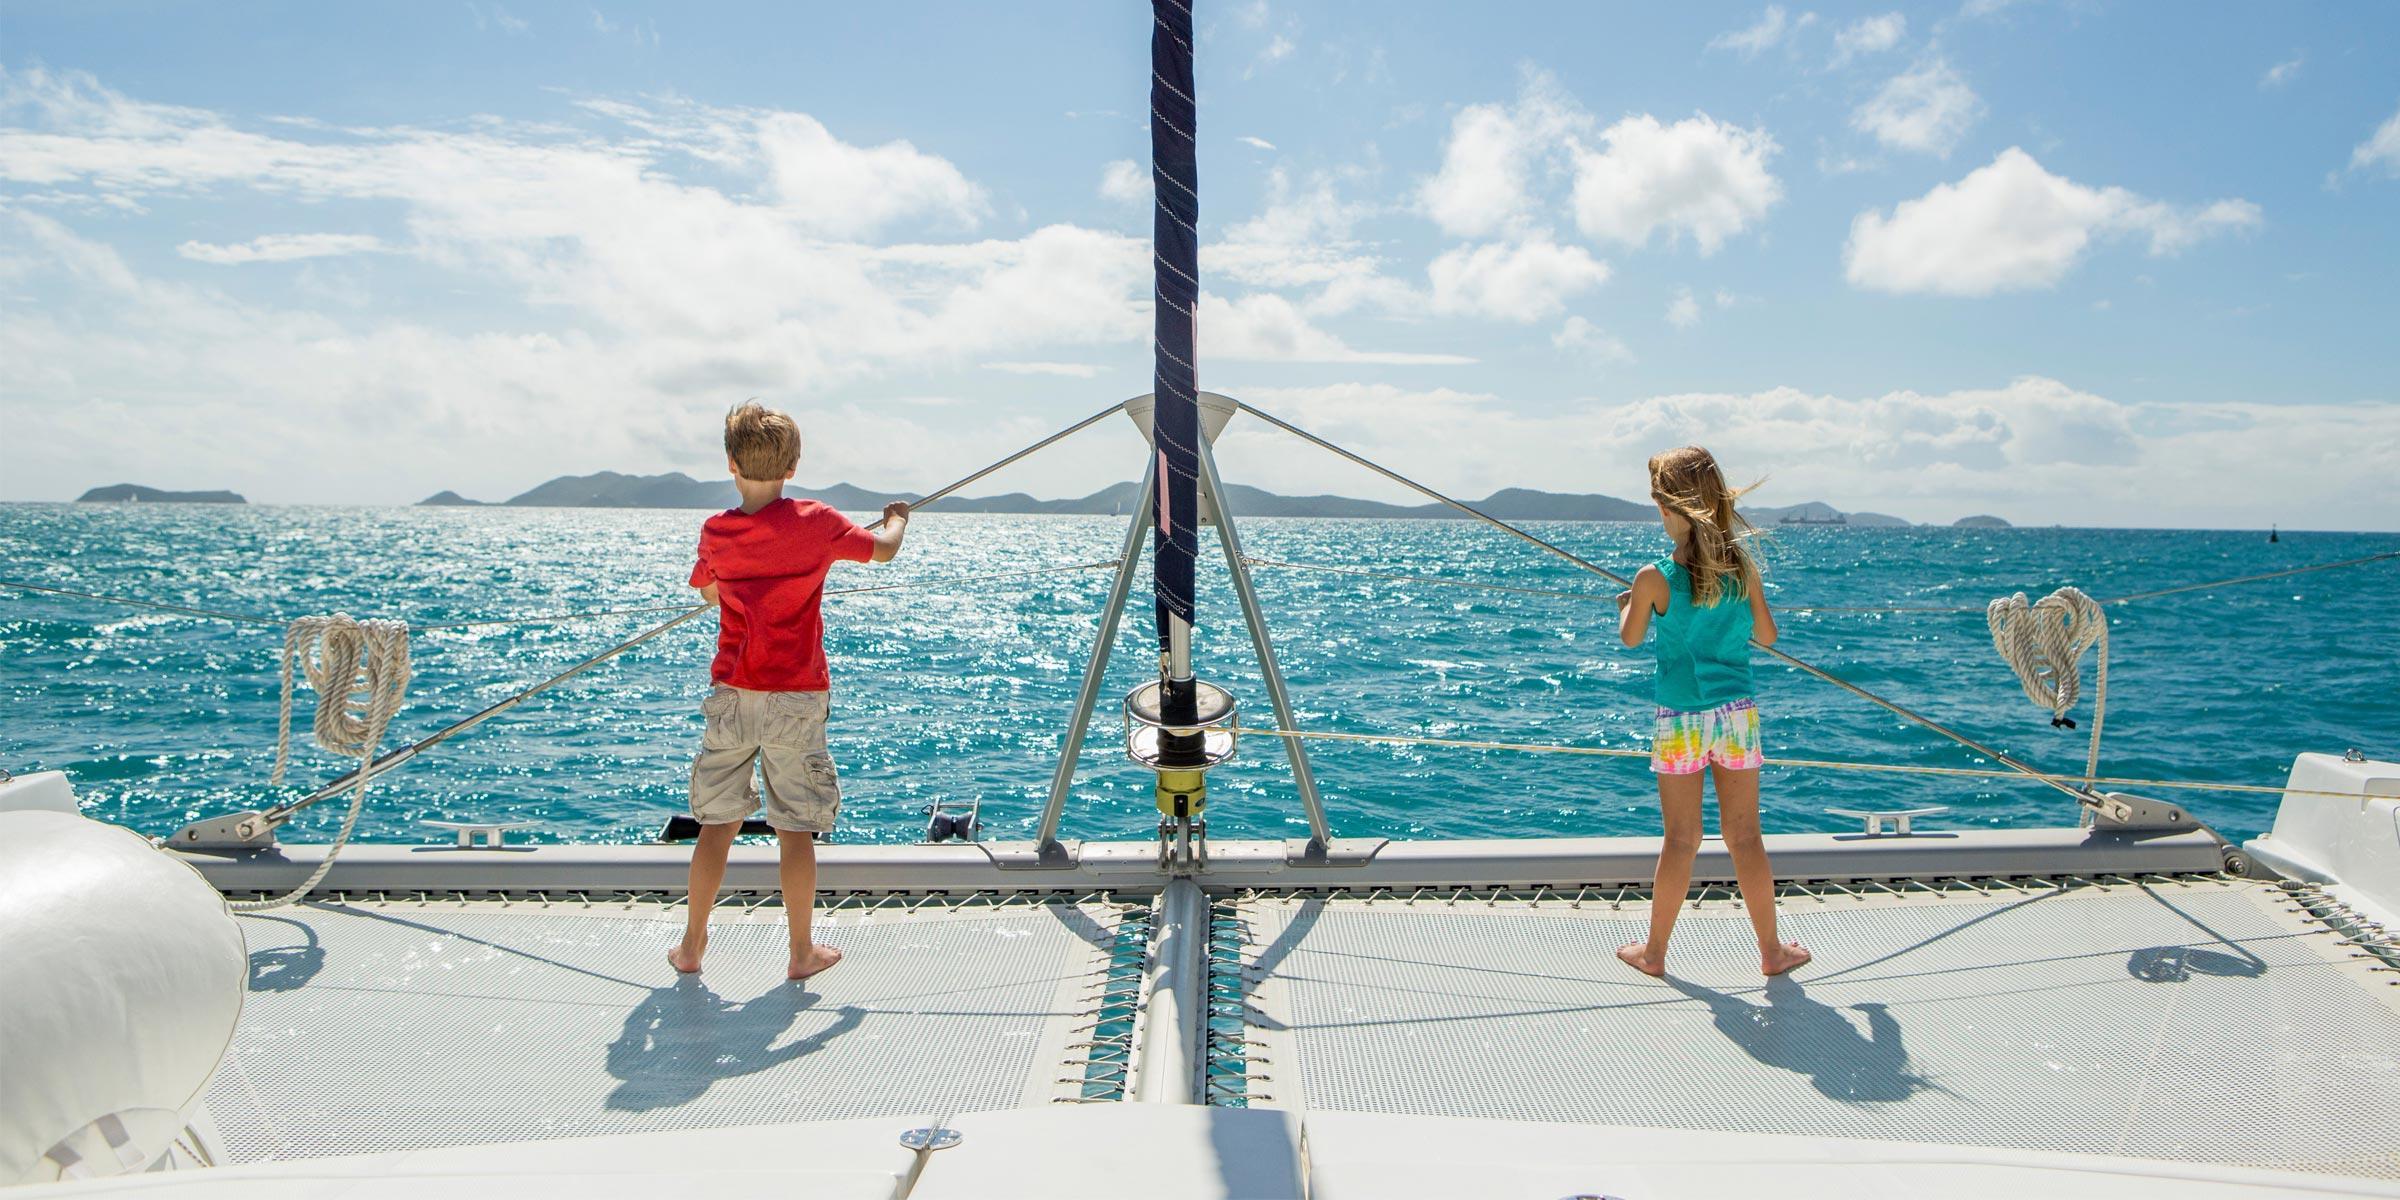 Children on catamaran trampoline in the BVI